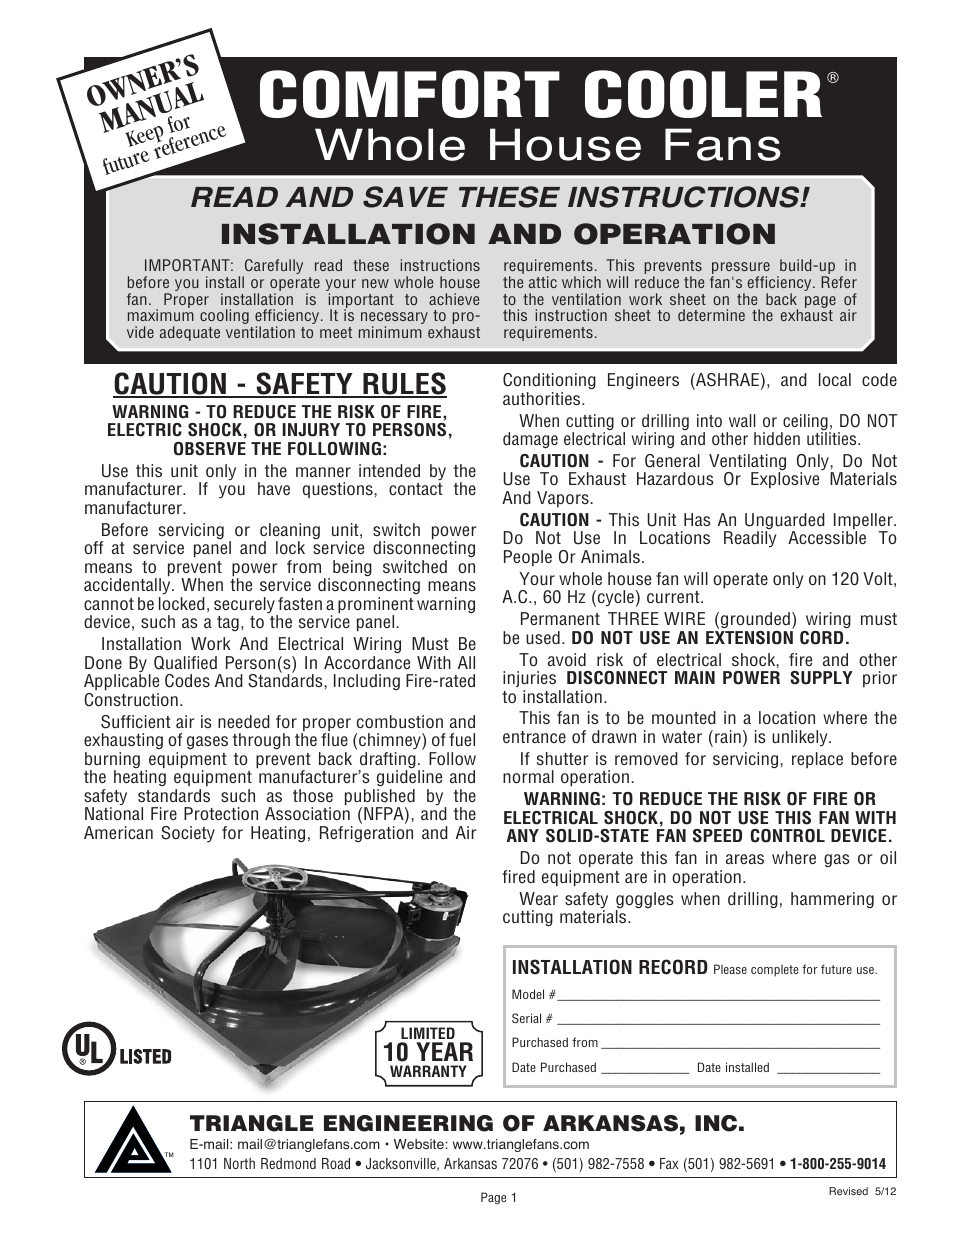 Triangle Engineering Of Arkansas Comfort Cooler User Manual